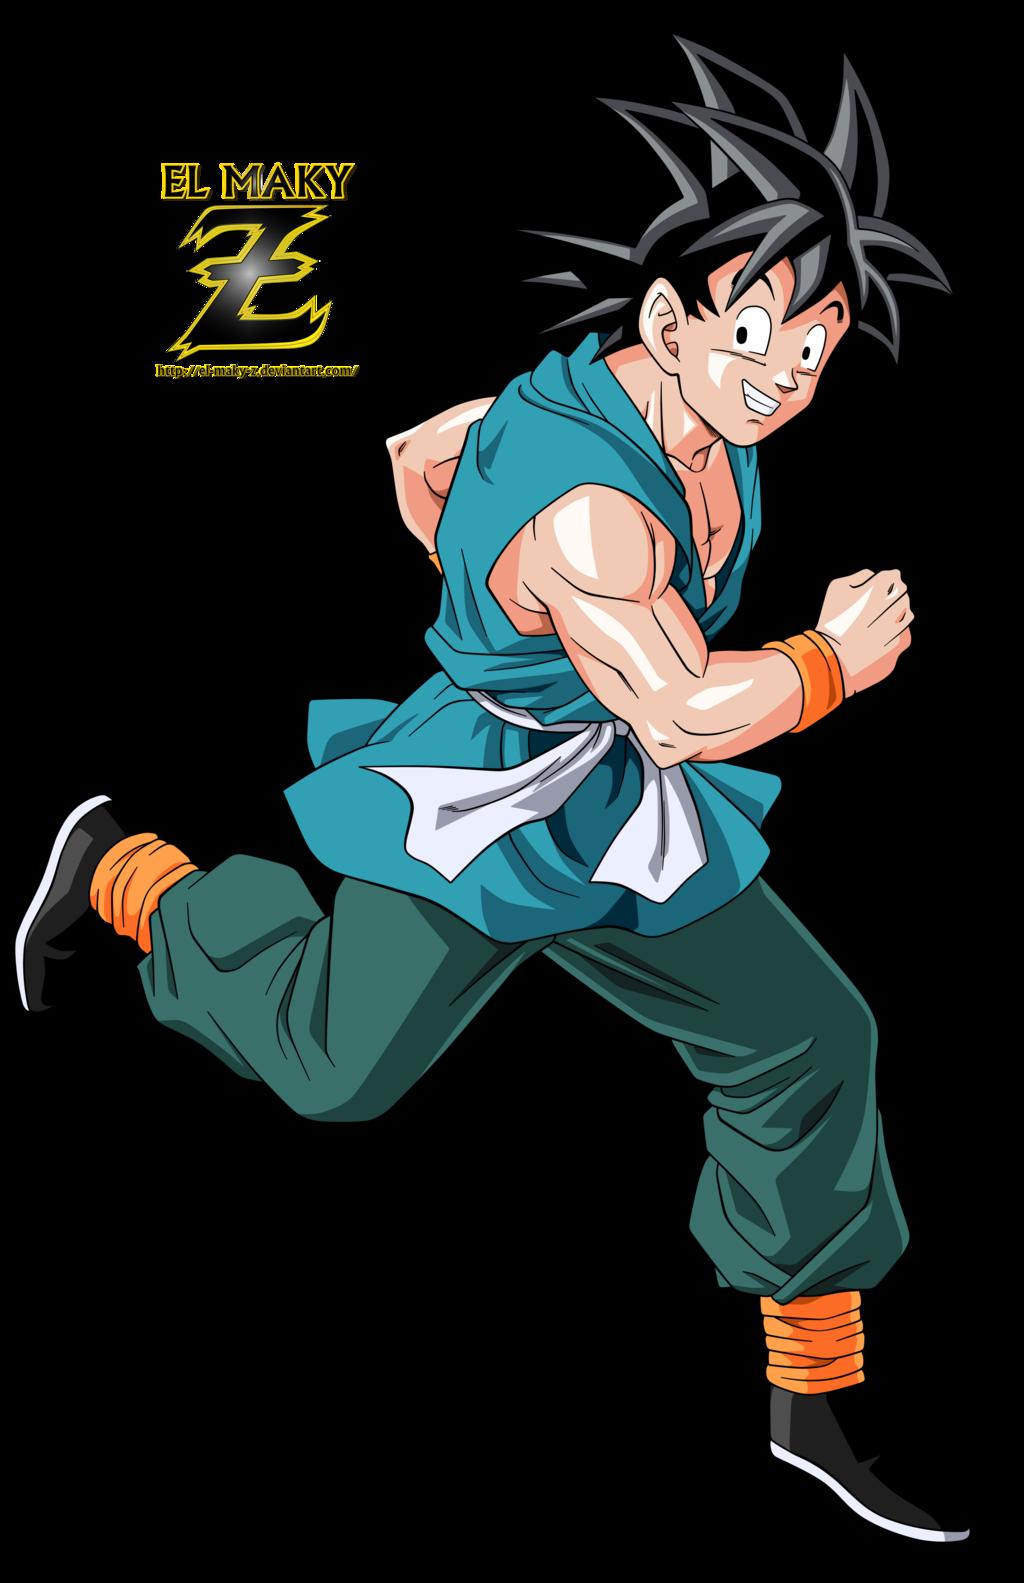 Goku End Of Dbz Anime Dragon Ball Dbz Characters Goku